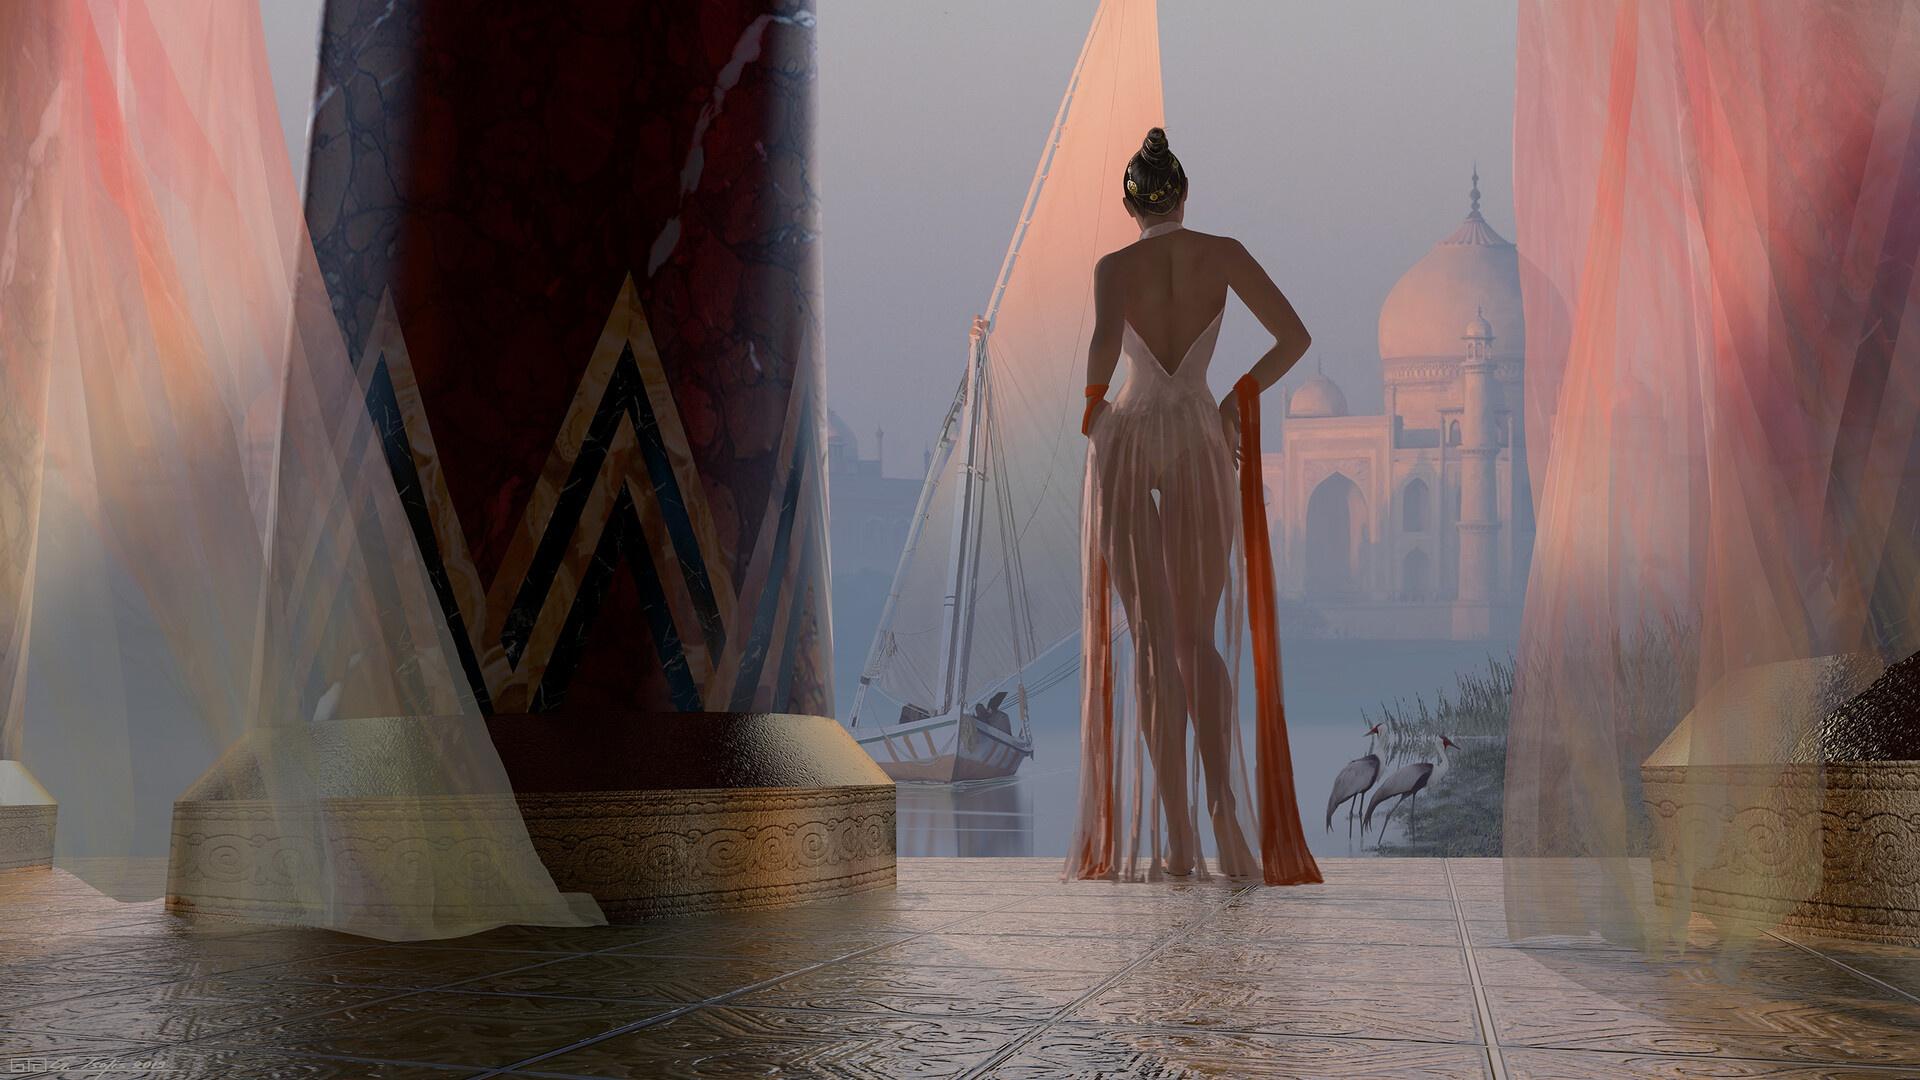 General 1920x1080 women Taj Mahal lake boat column birds back bare shoulders hairbun artwork digital art illustration India